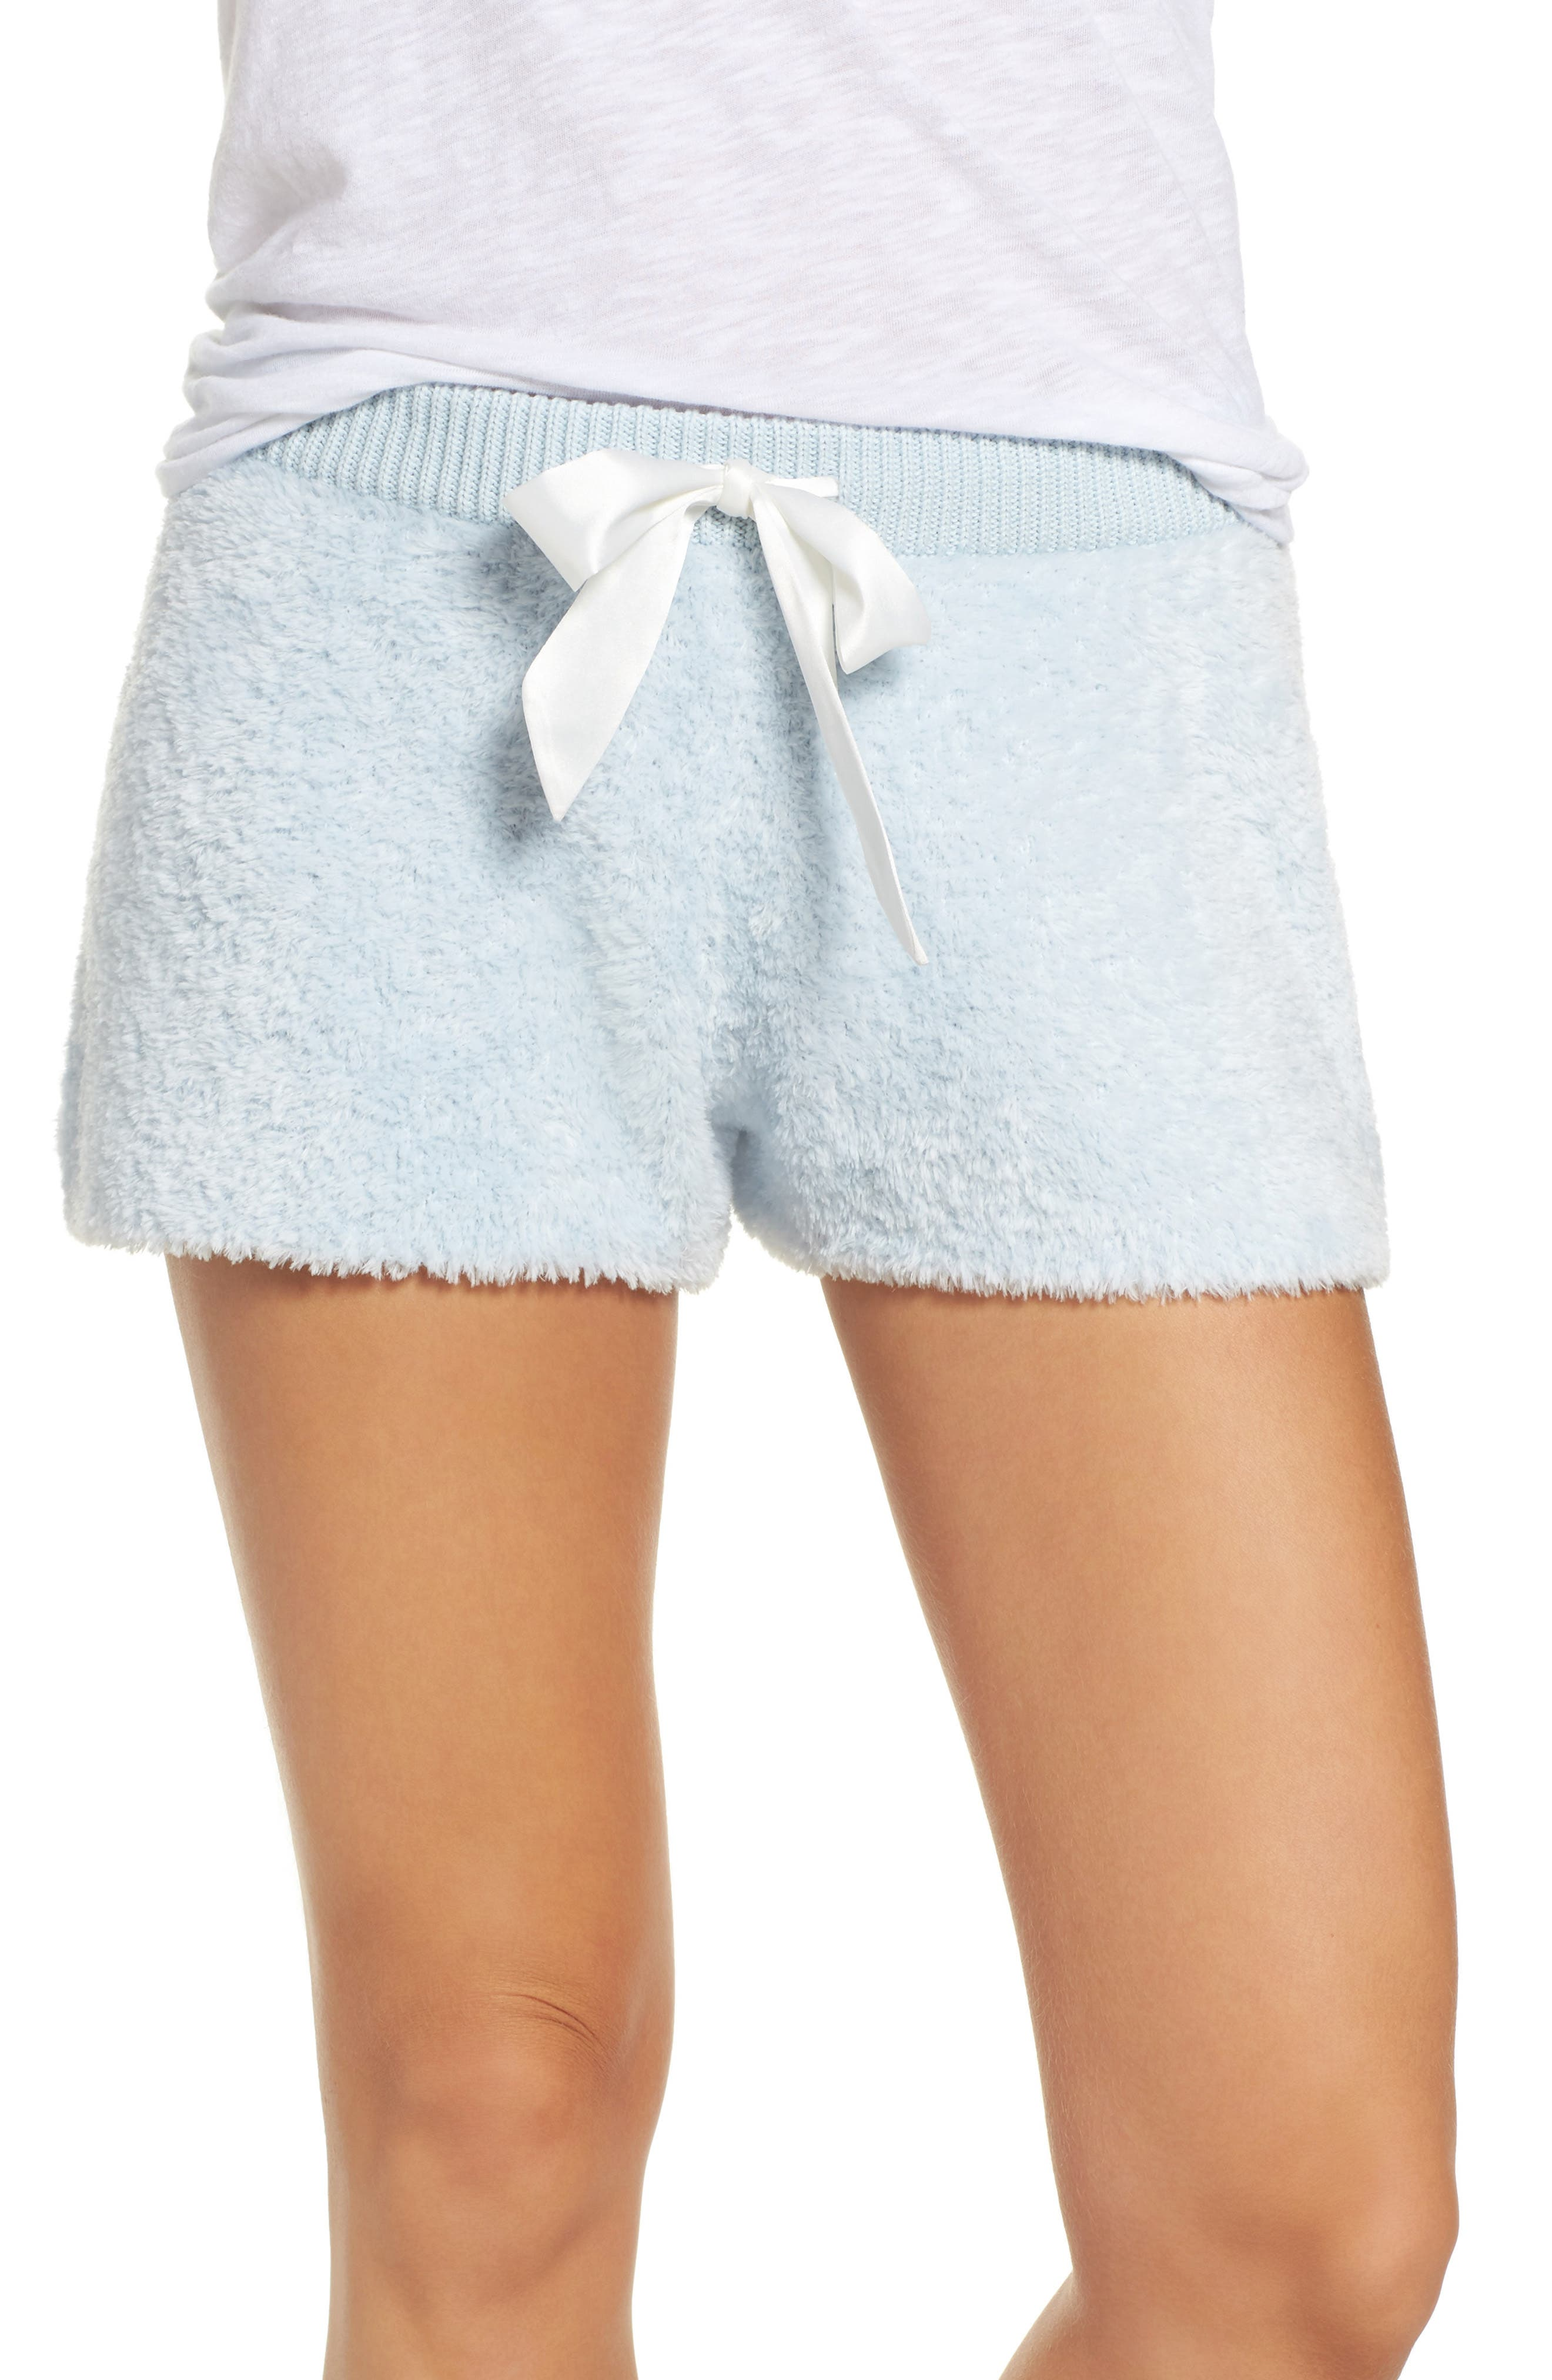 Fuzzy Lounge Shorts,                             Main thumbnail 1, color,                             Blue Drift